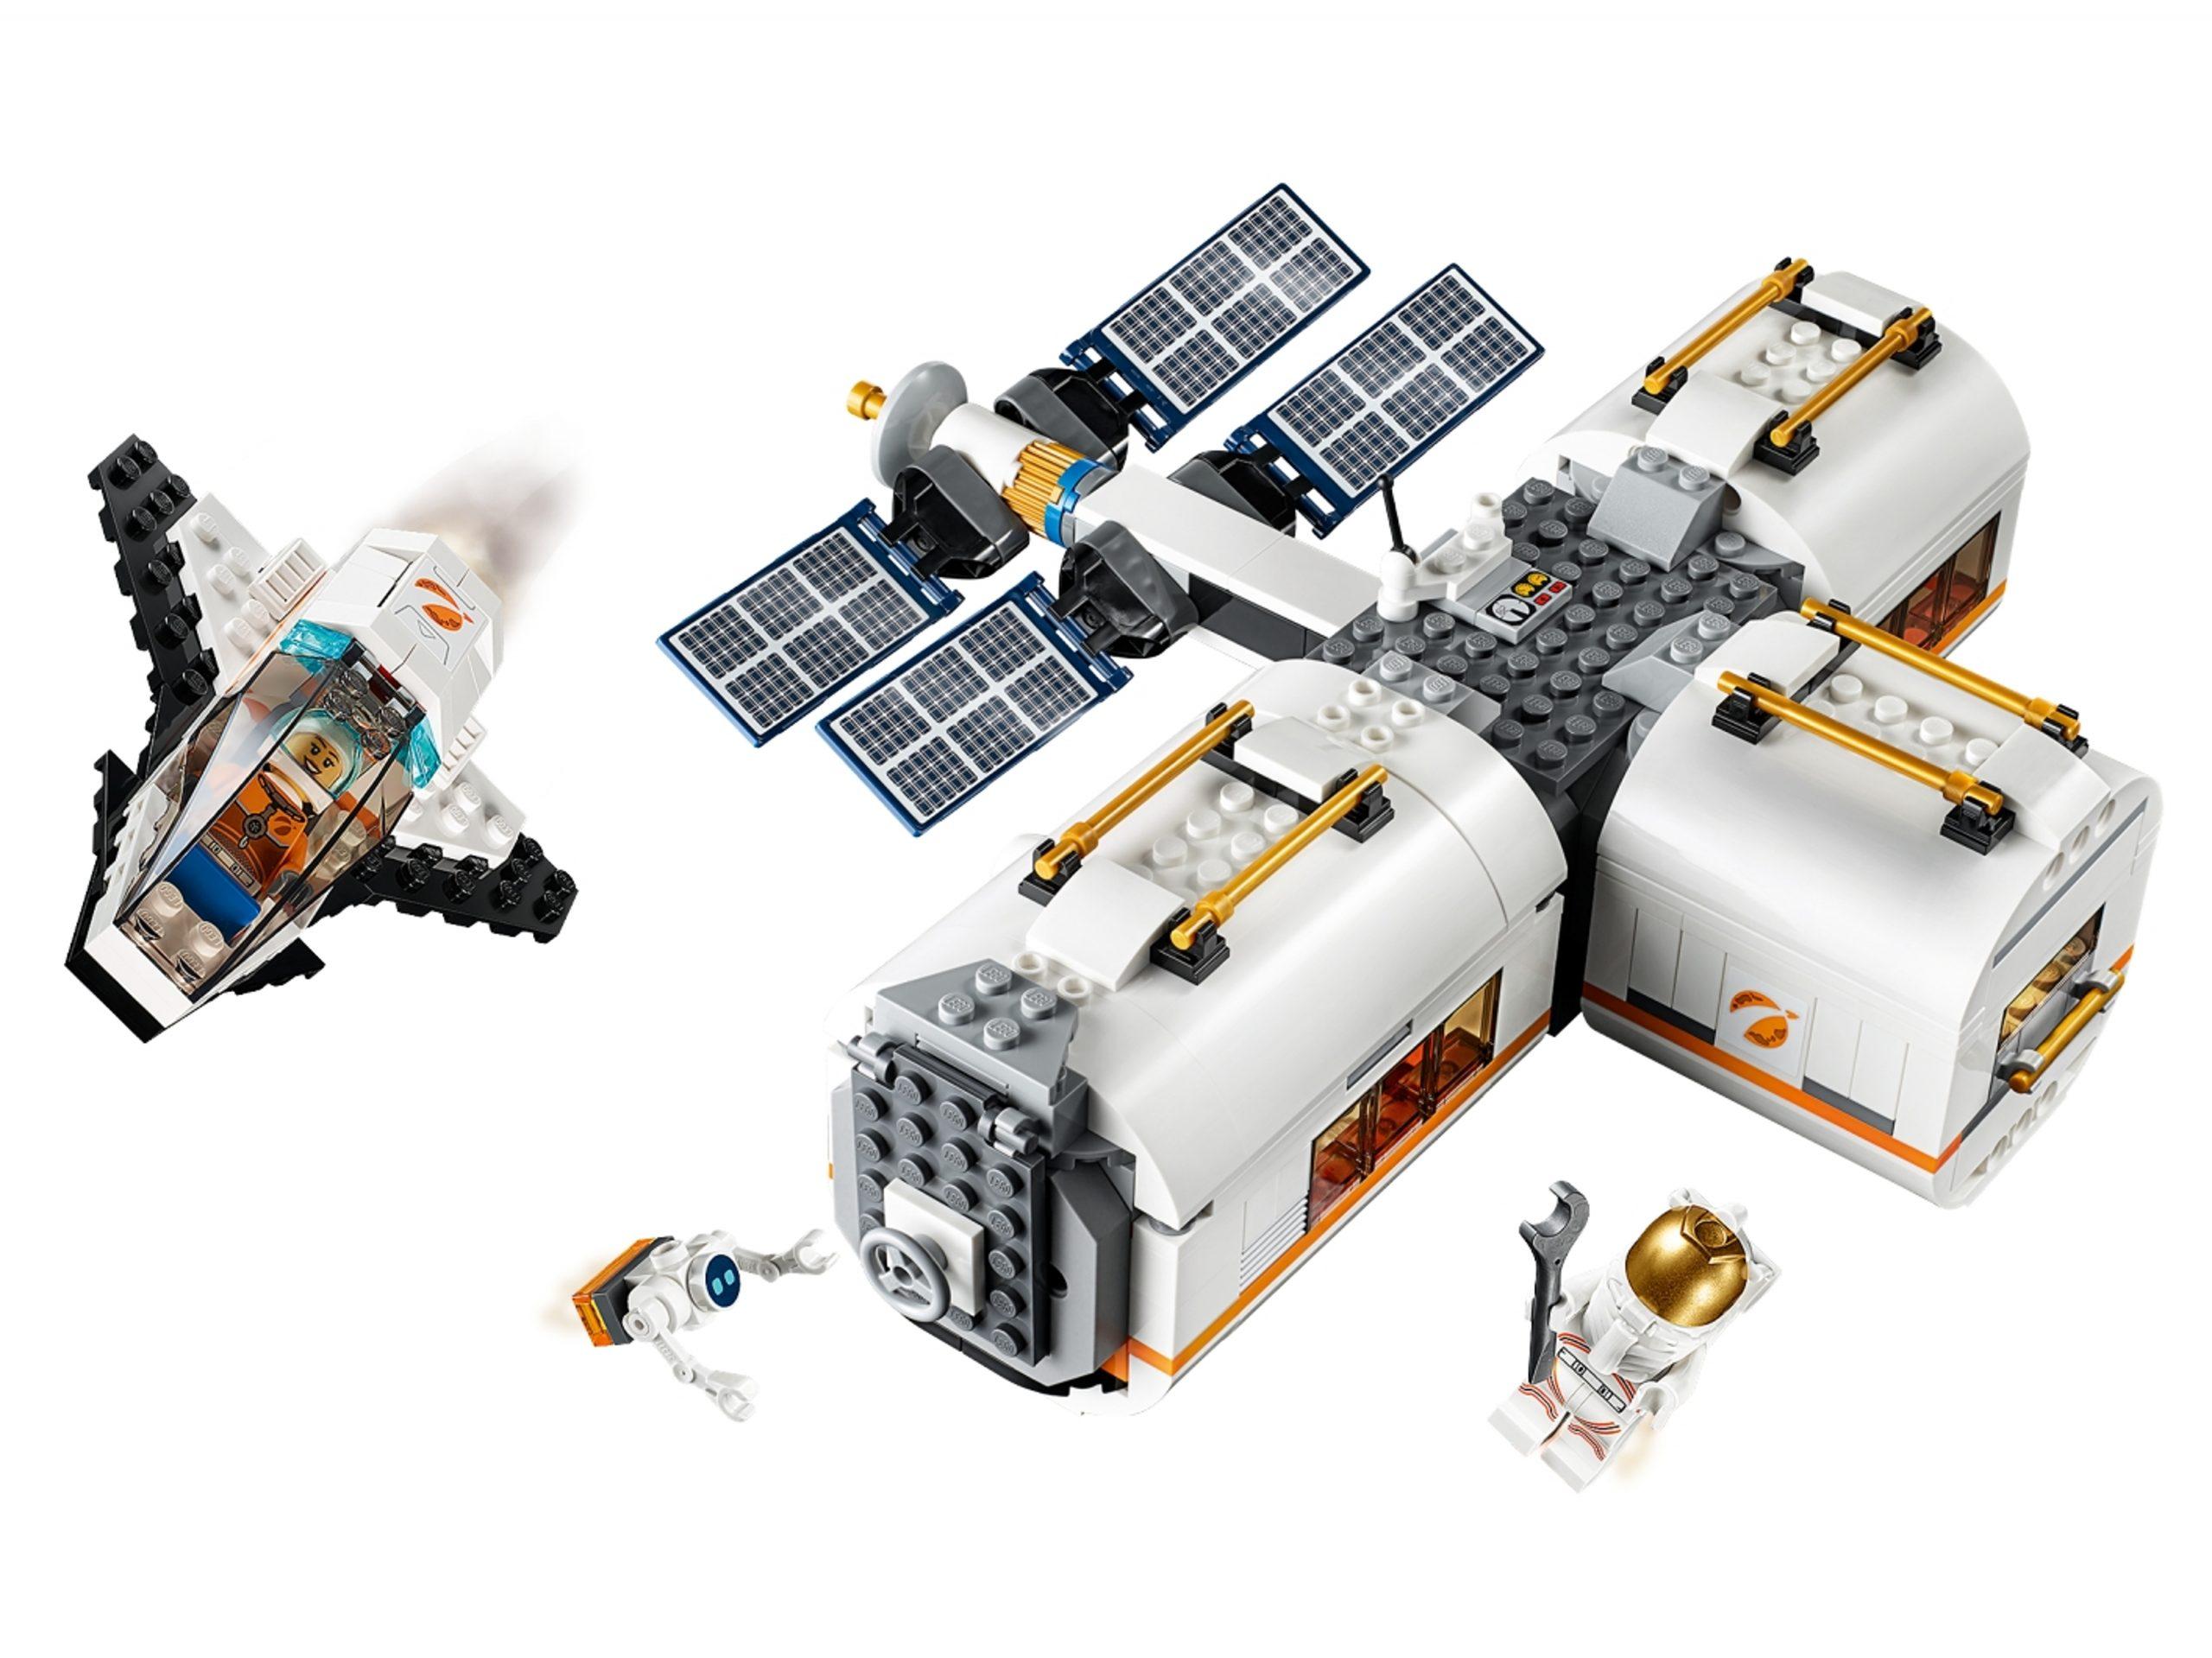 lego 60227 lunar space station scaled